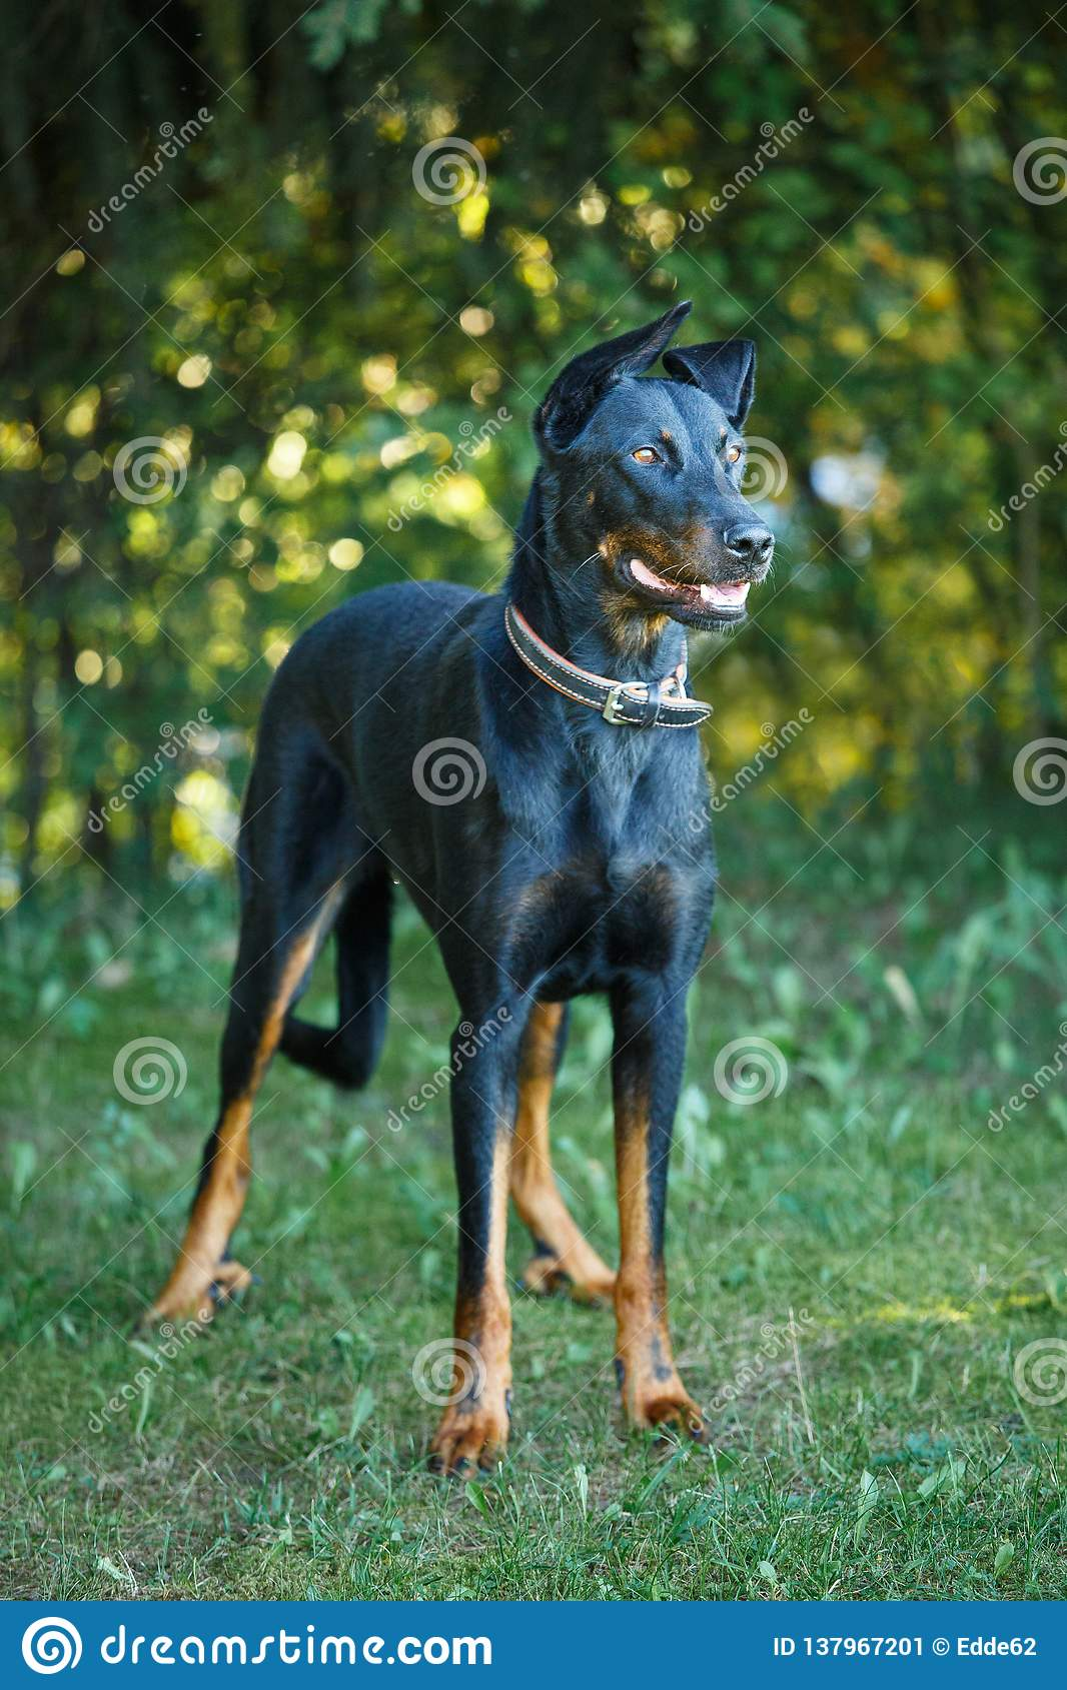 Black and tan Doberman pintcher standing outside